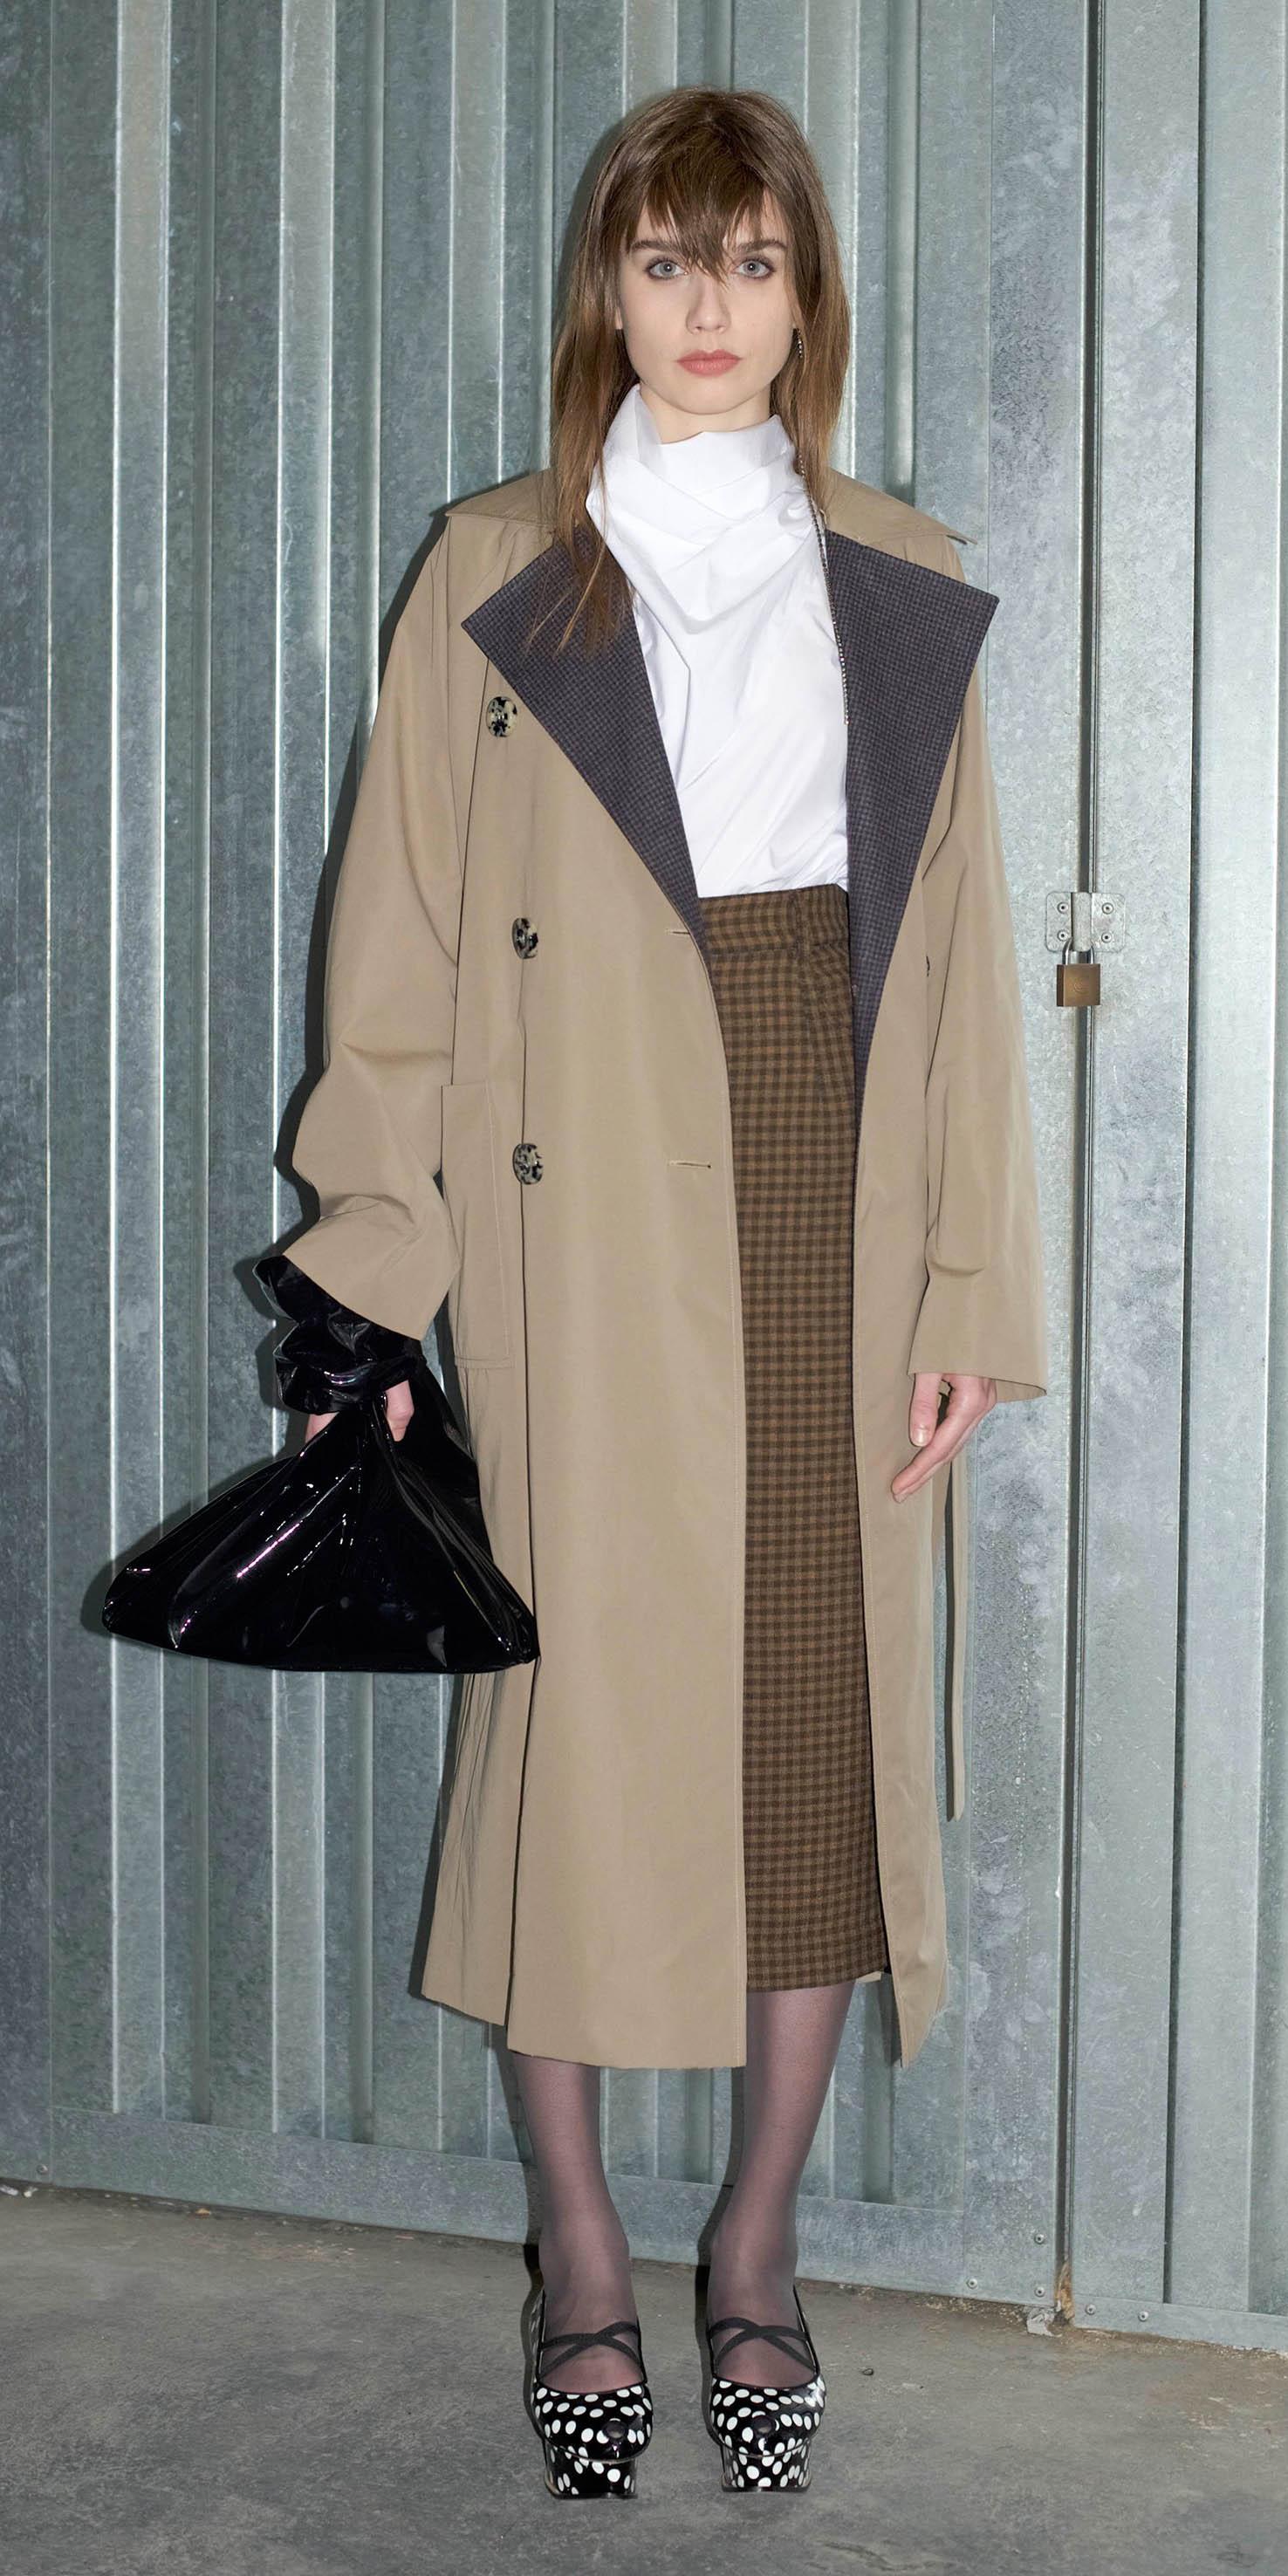 brown-midi-skirt-black-tights-hairr-tan-jacket-coat-trench-fall-winter-dinner.jpg